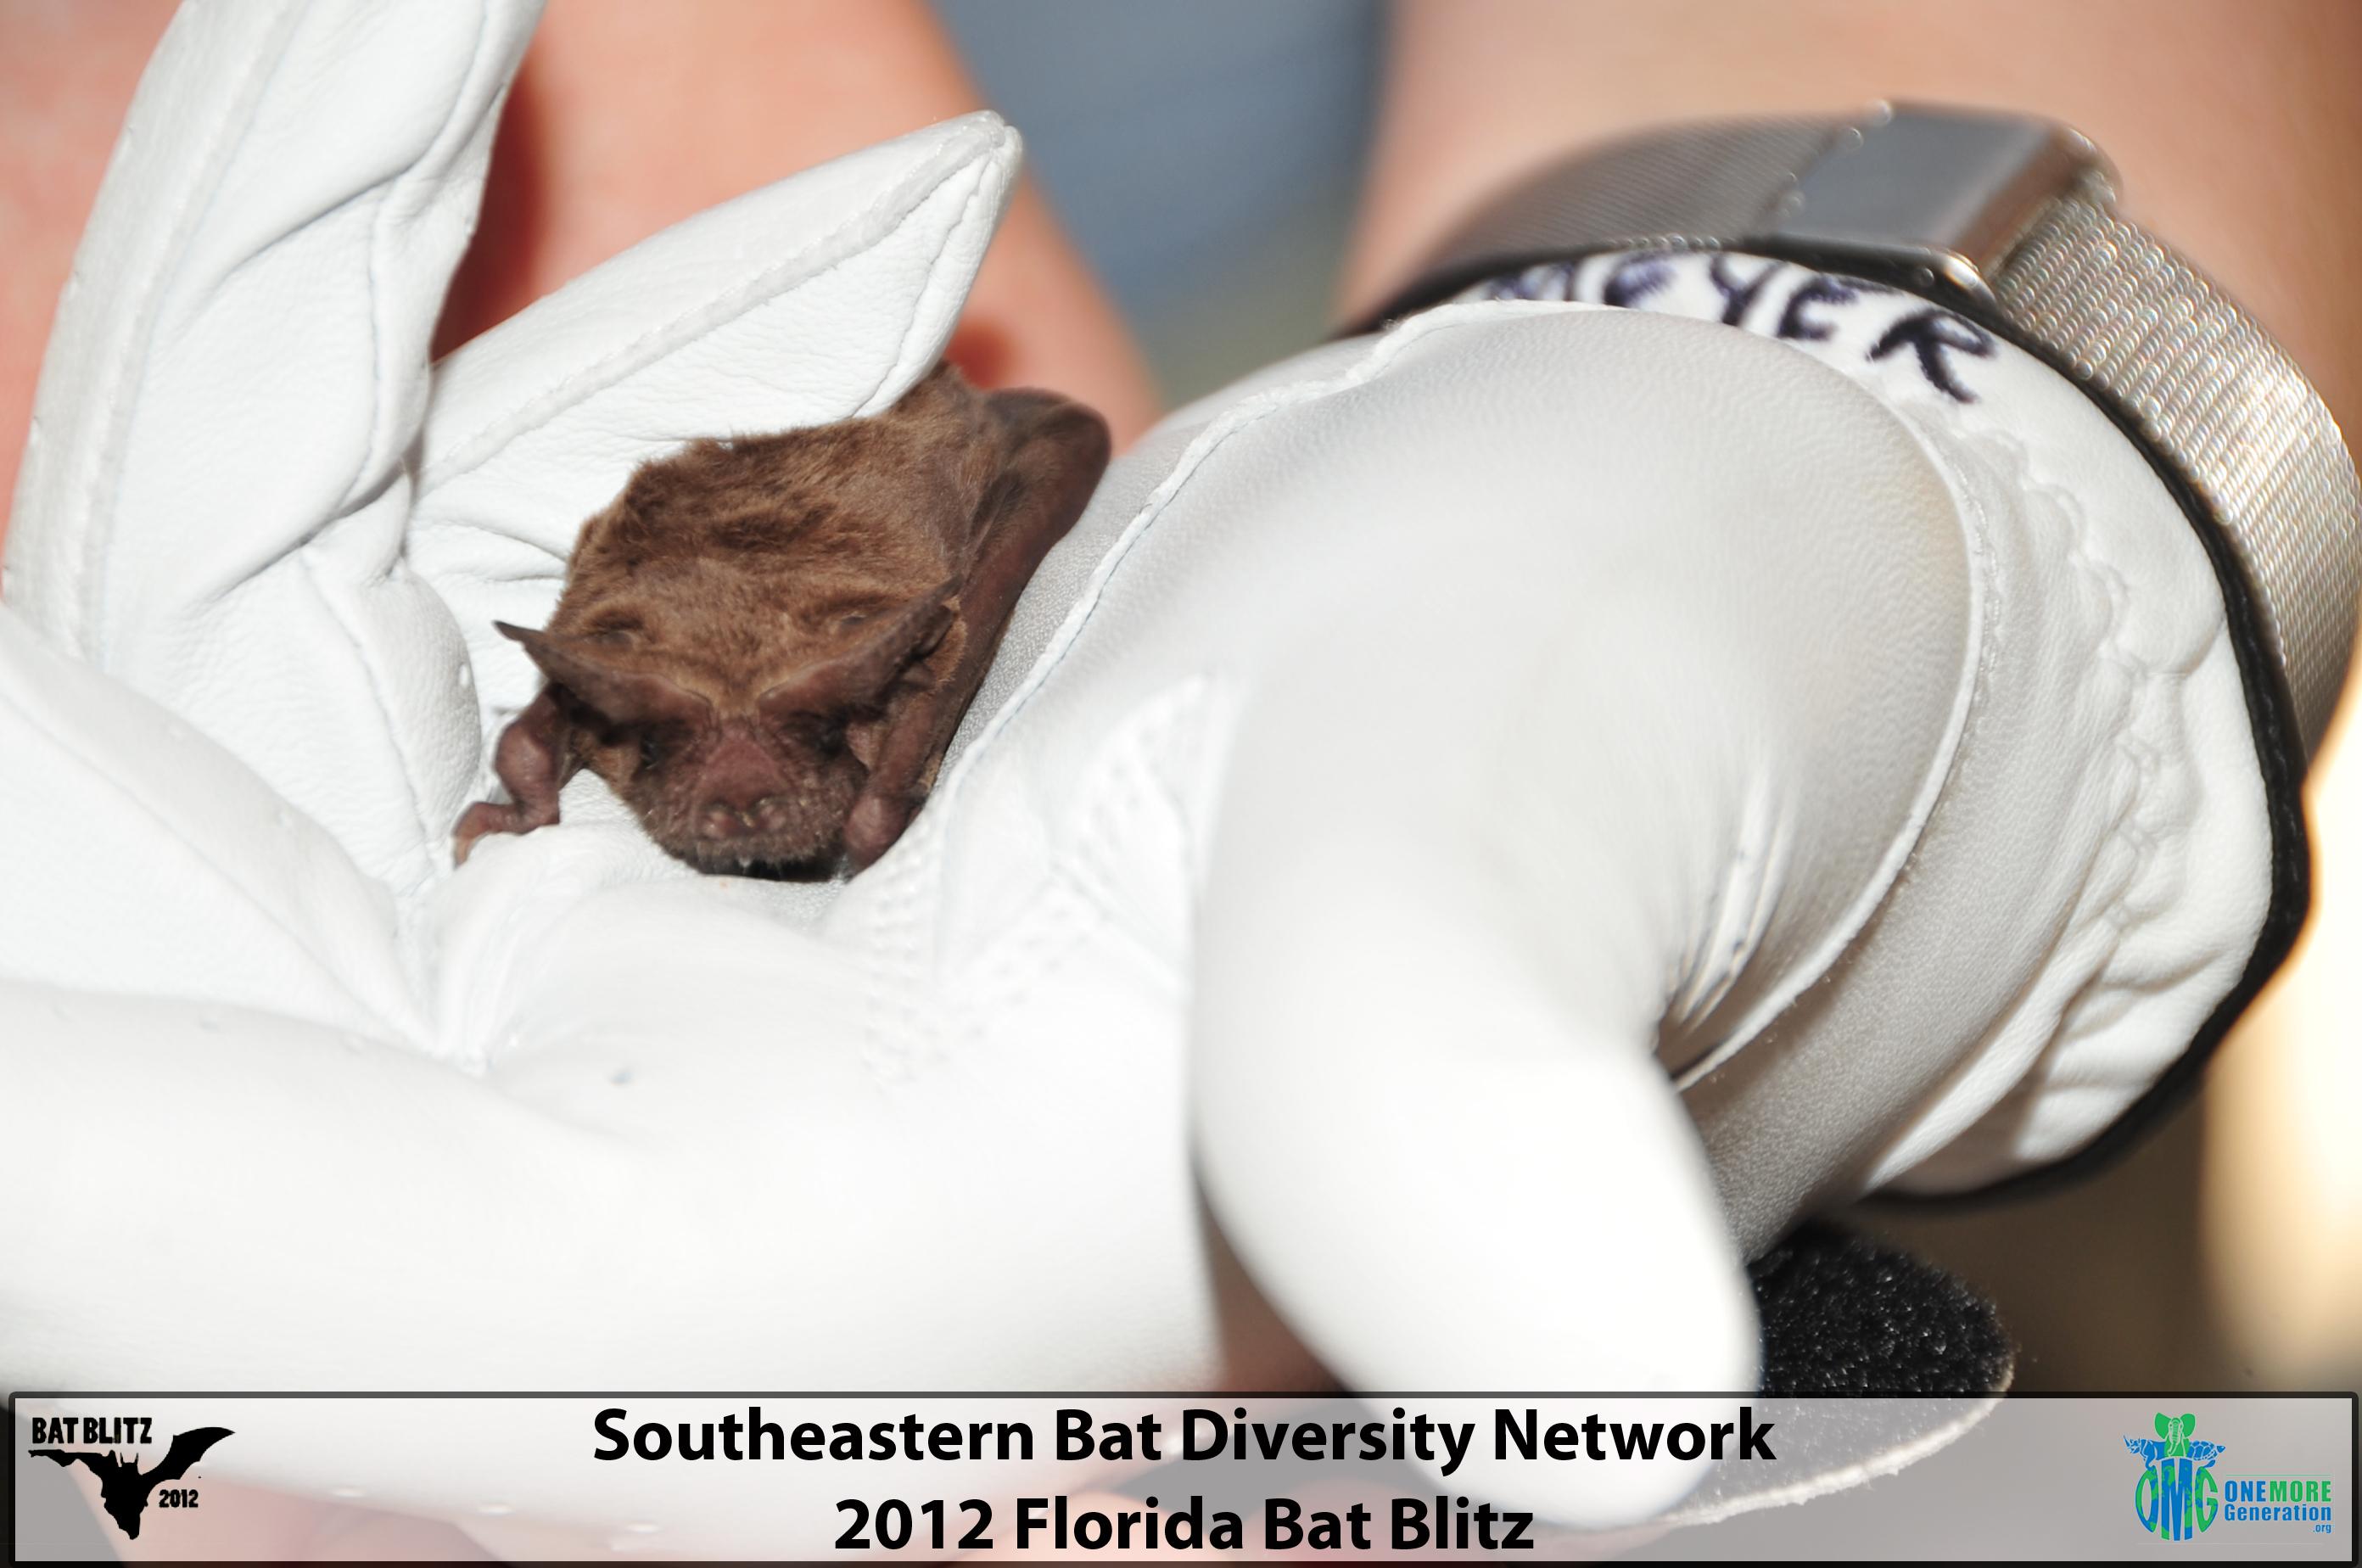 2012 SBDN (Southeastern Bat Diversity Network) Bat Blitz